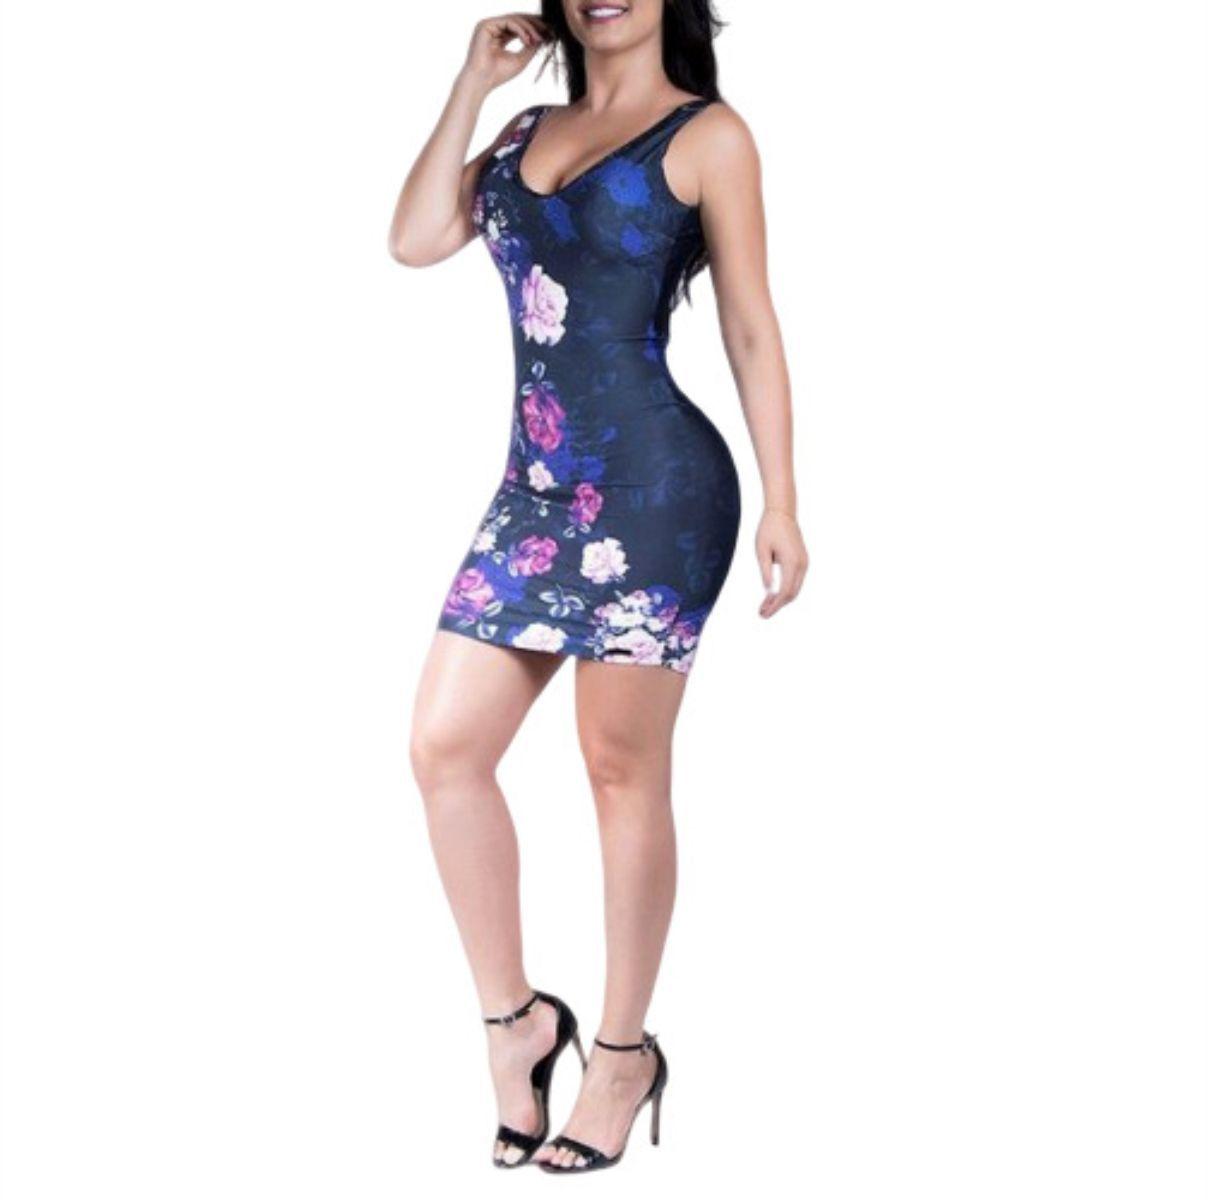 Vestido Pit Bull Jeans Ref 30015 Azul Floral